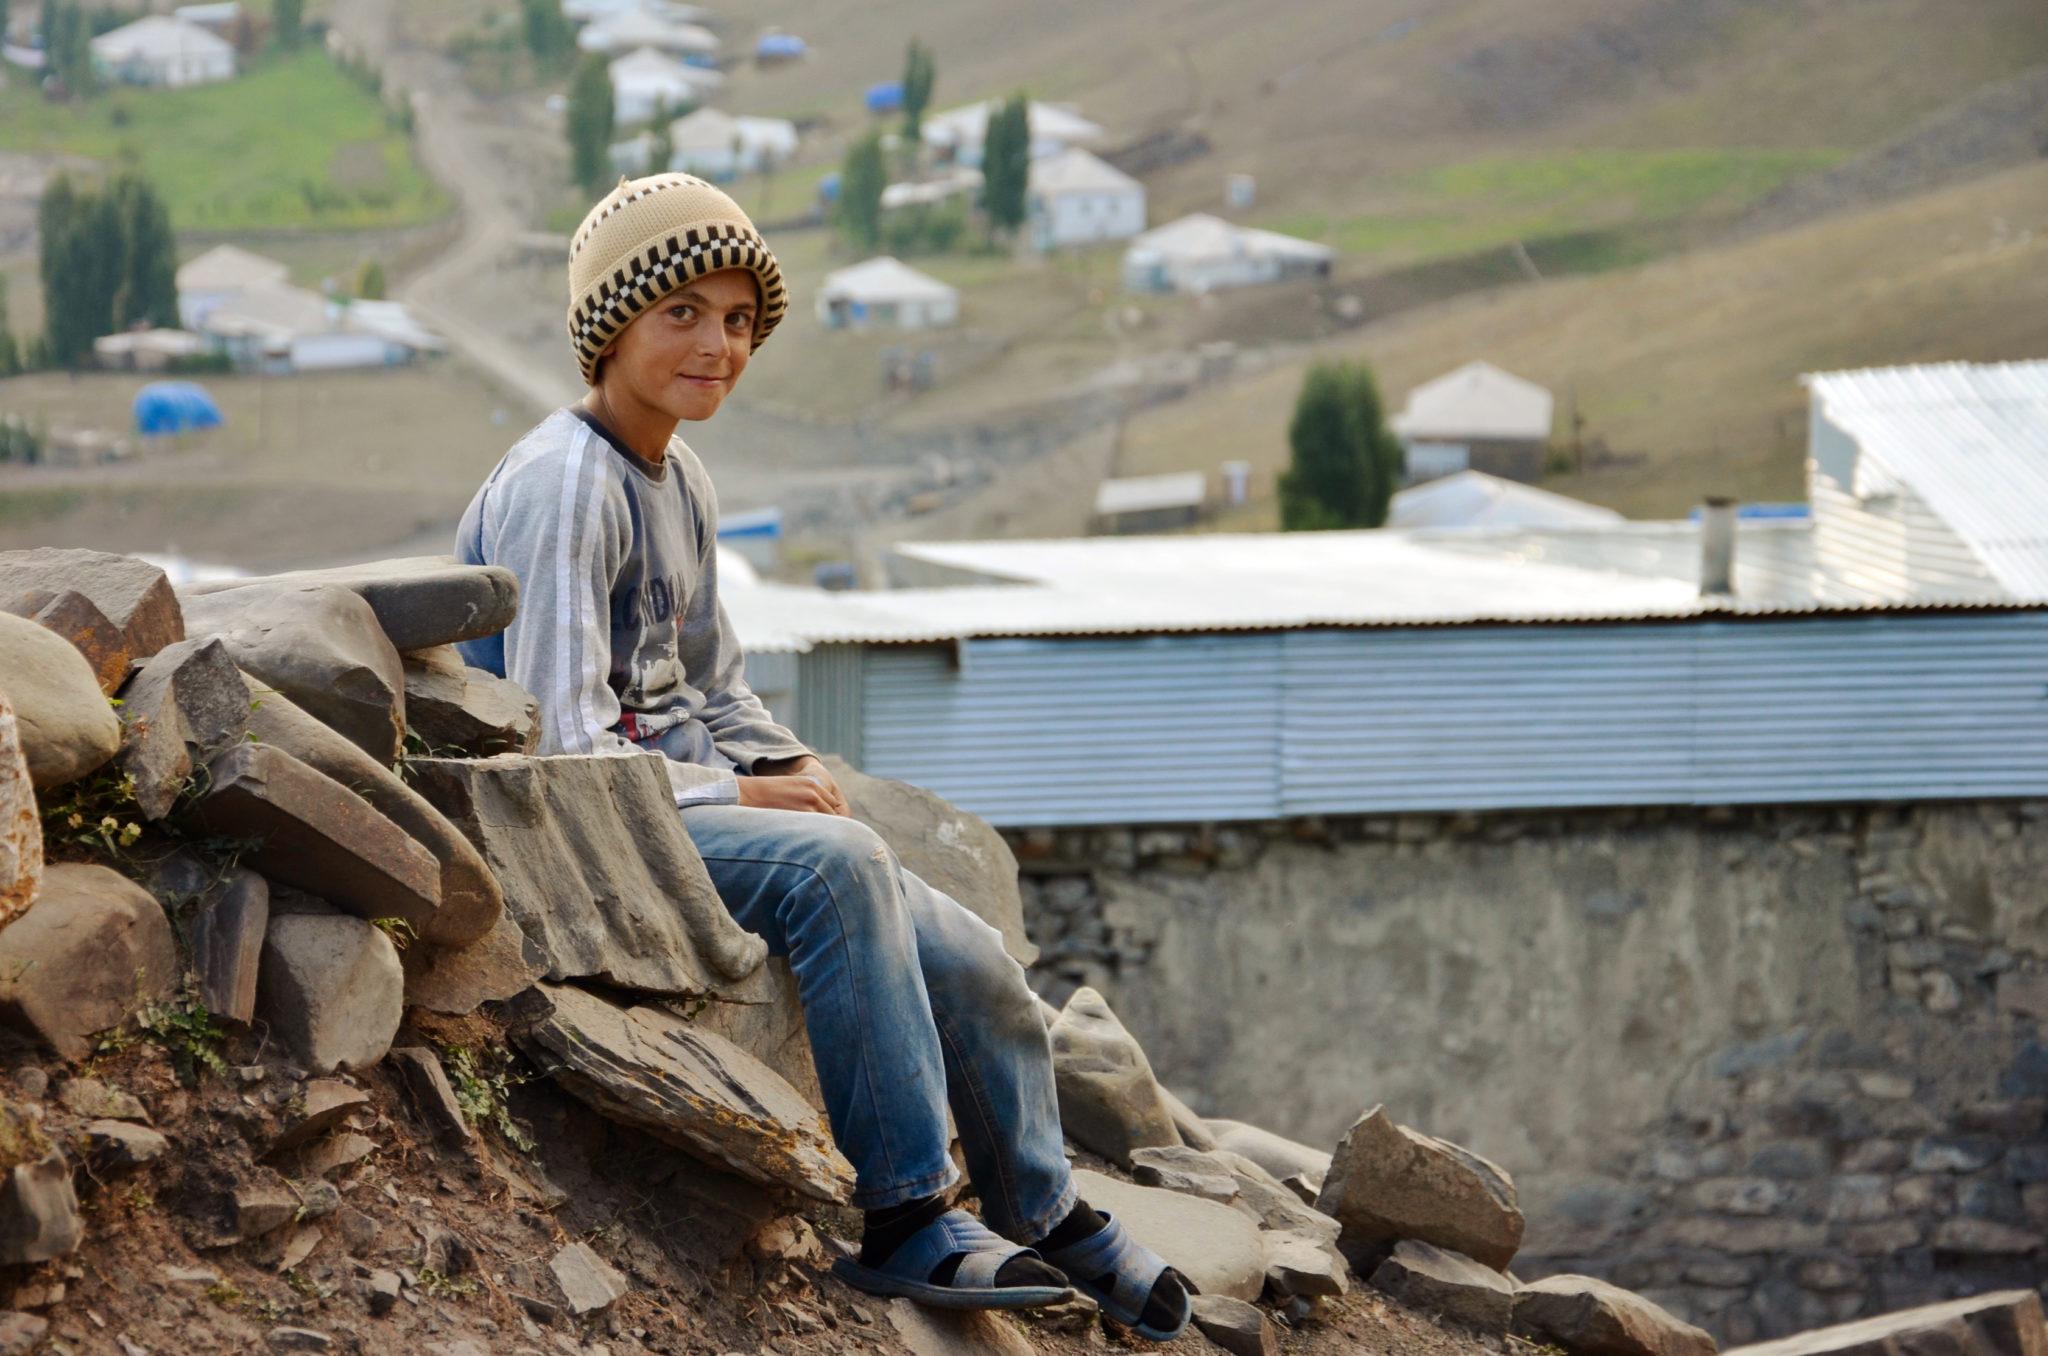 Aserbaidschan-Reisetipps-Xinalig-Junge-Kaukasus